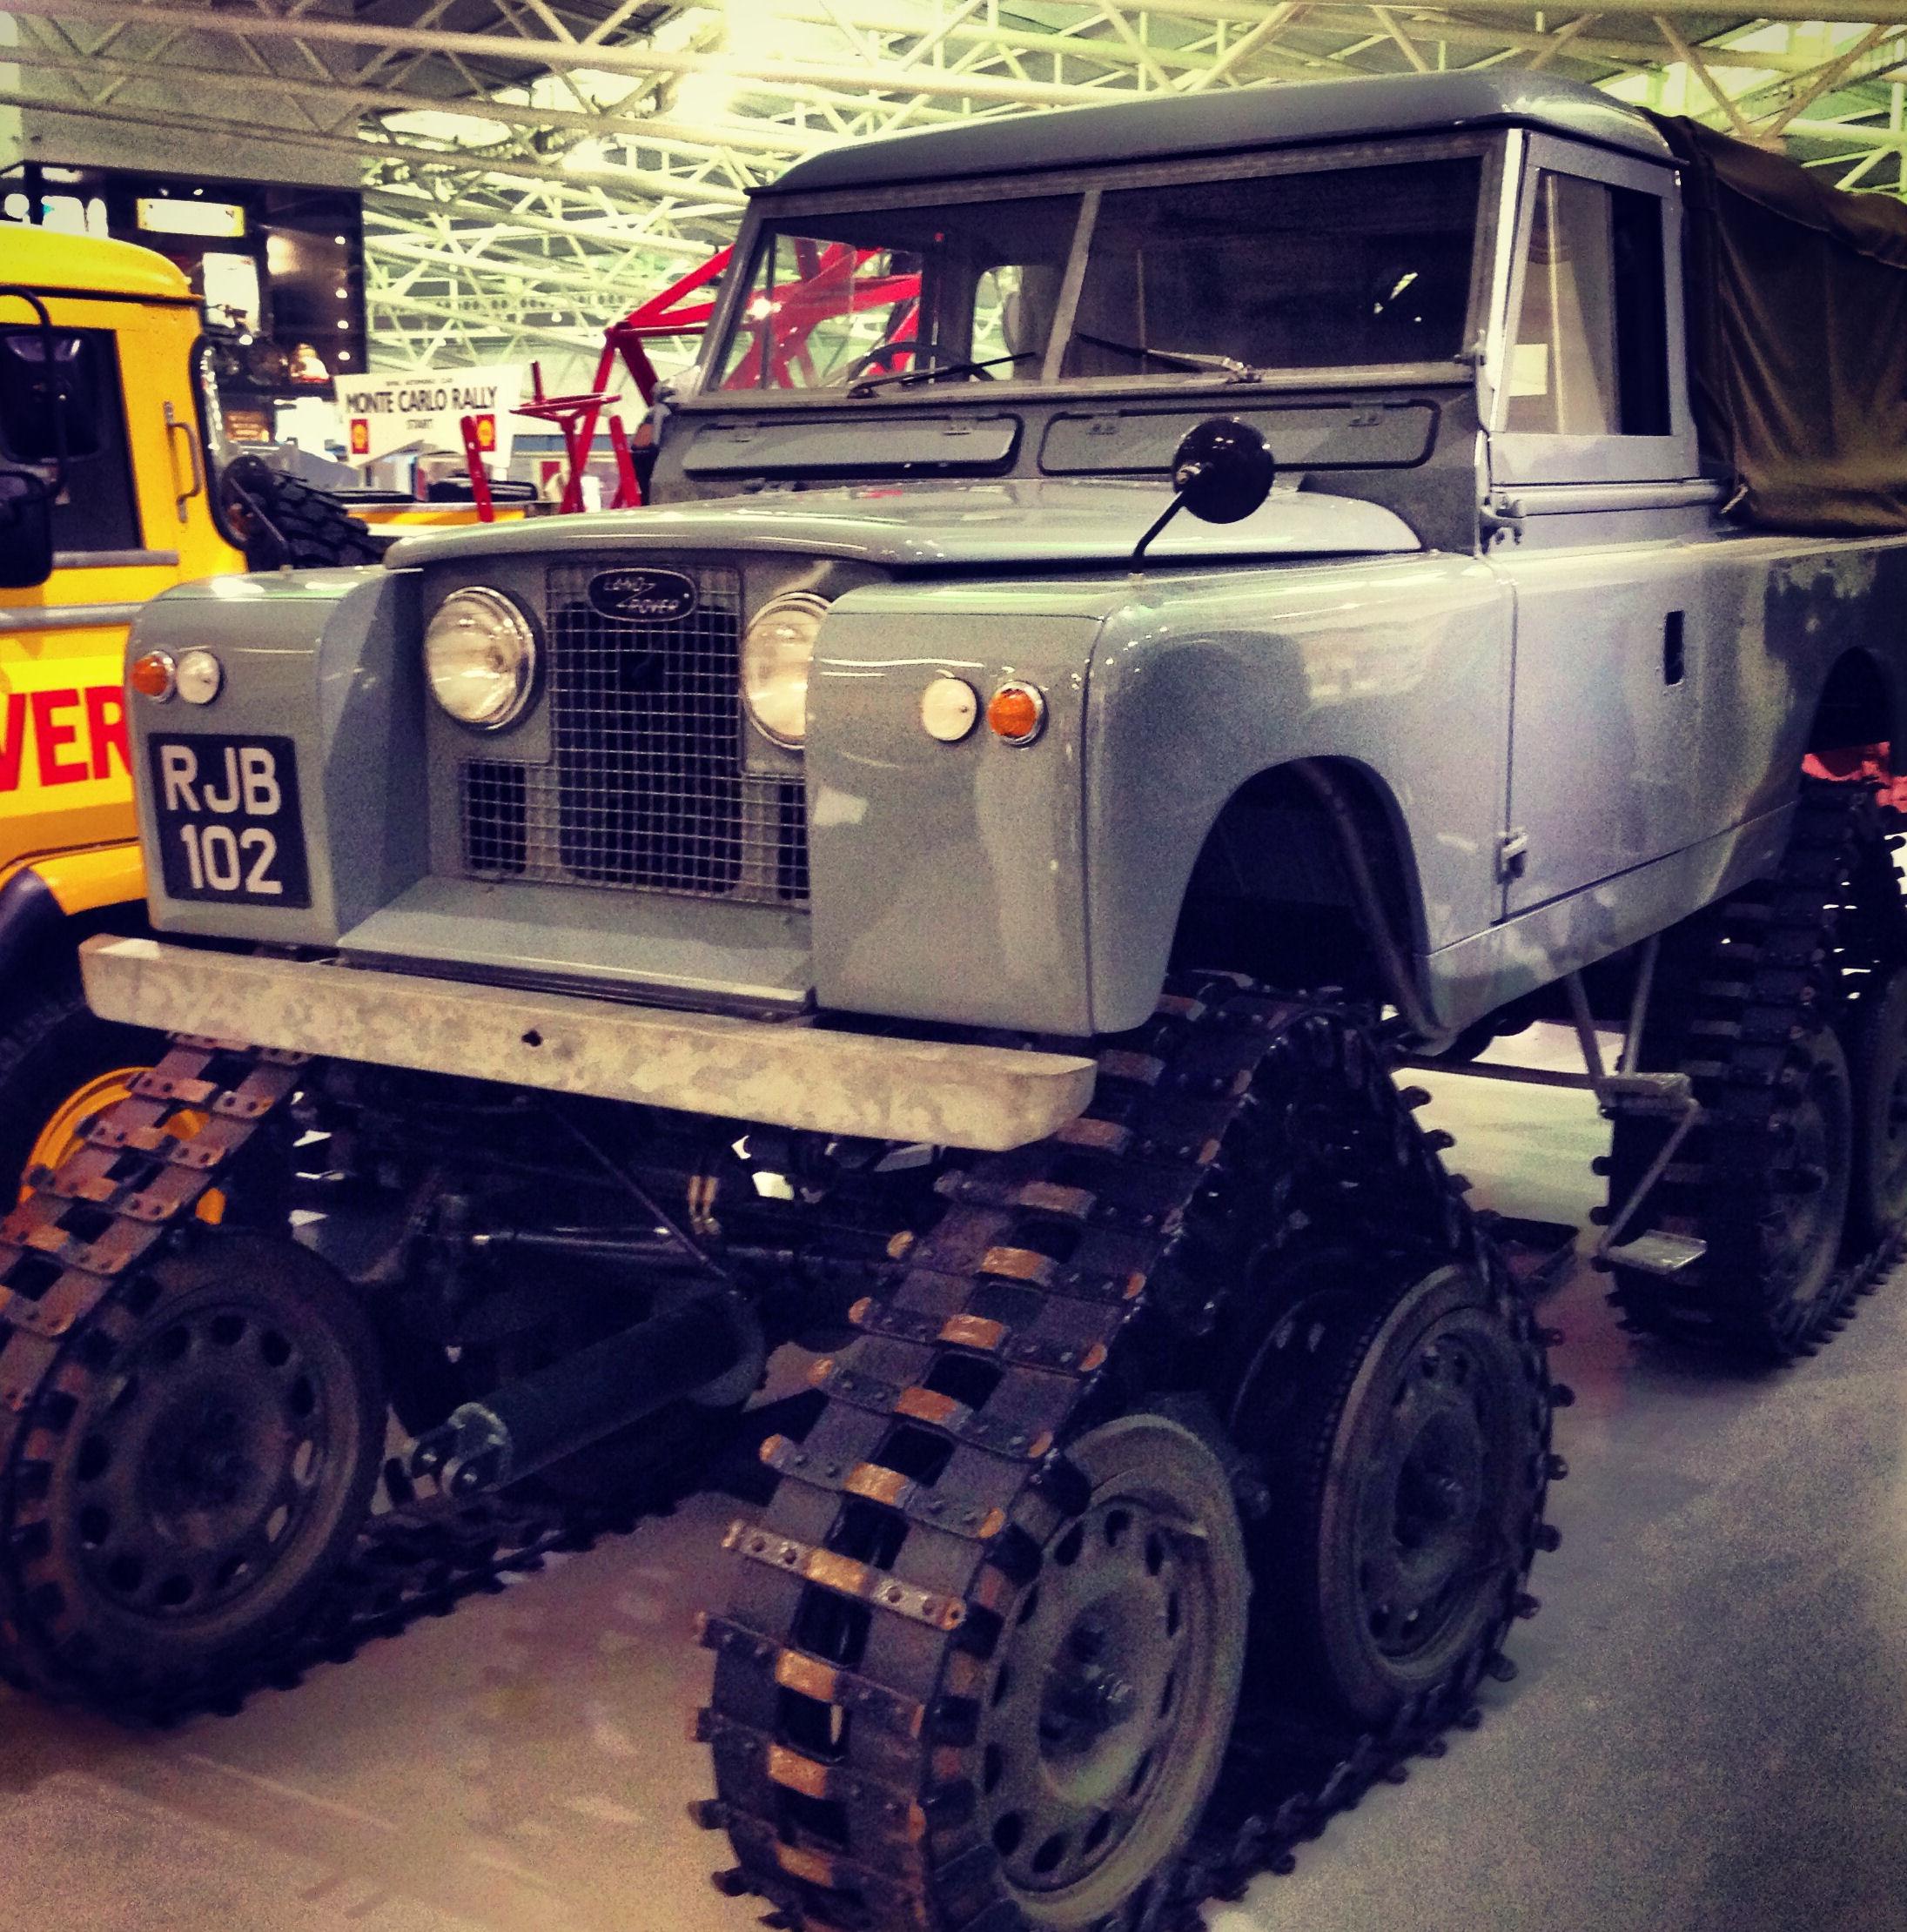 Model Land Movie: Heritage Motor Centre In Gayton Warwickshire